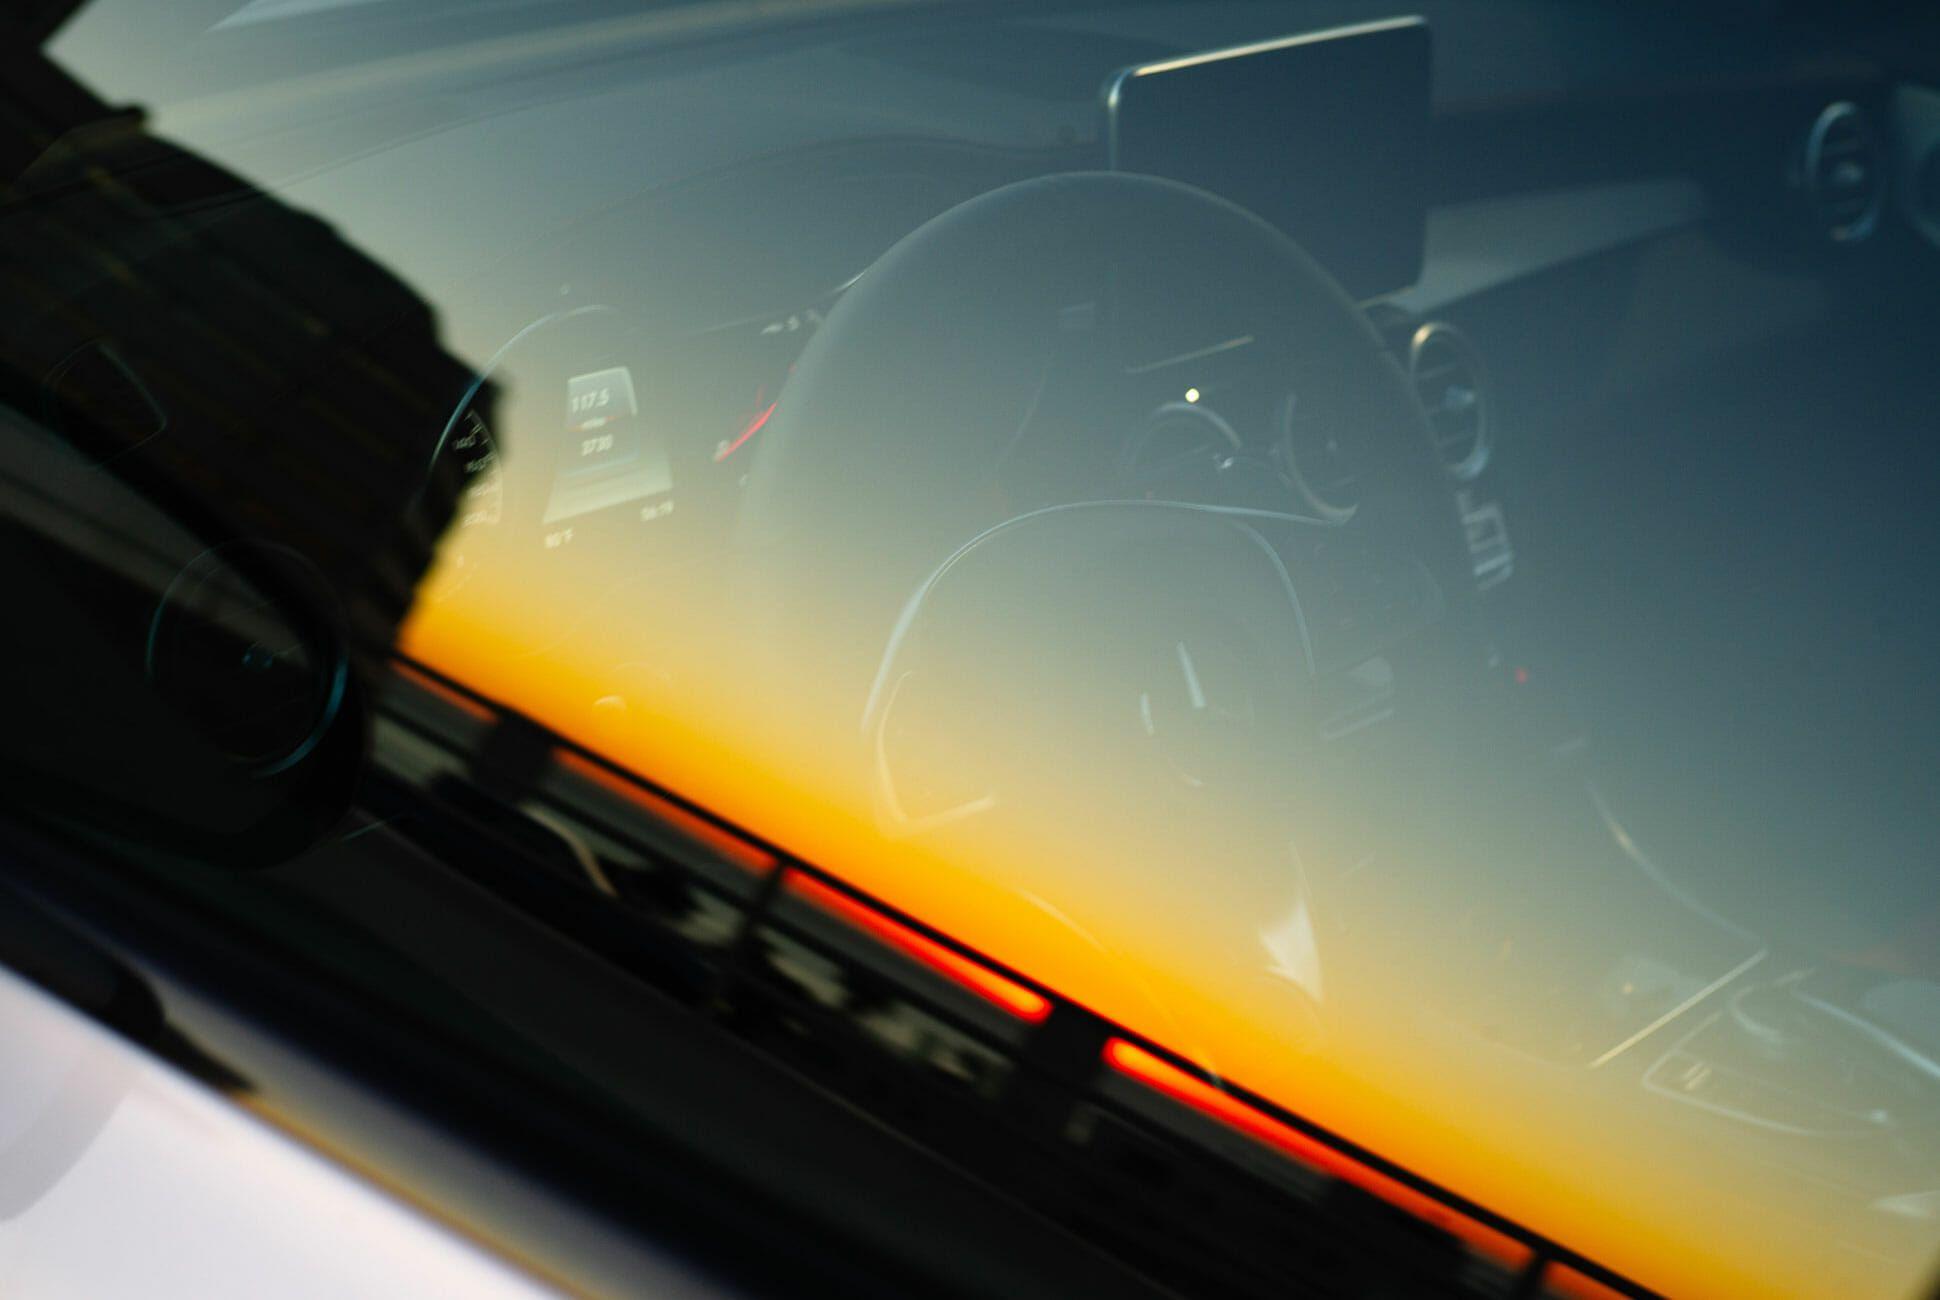 Mercedes-AMG-GLC-63-S-Review-gear-patrol-slide-7